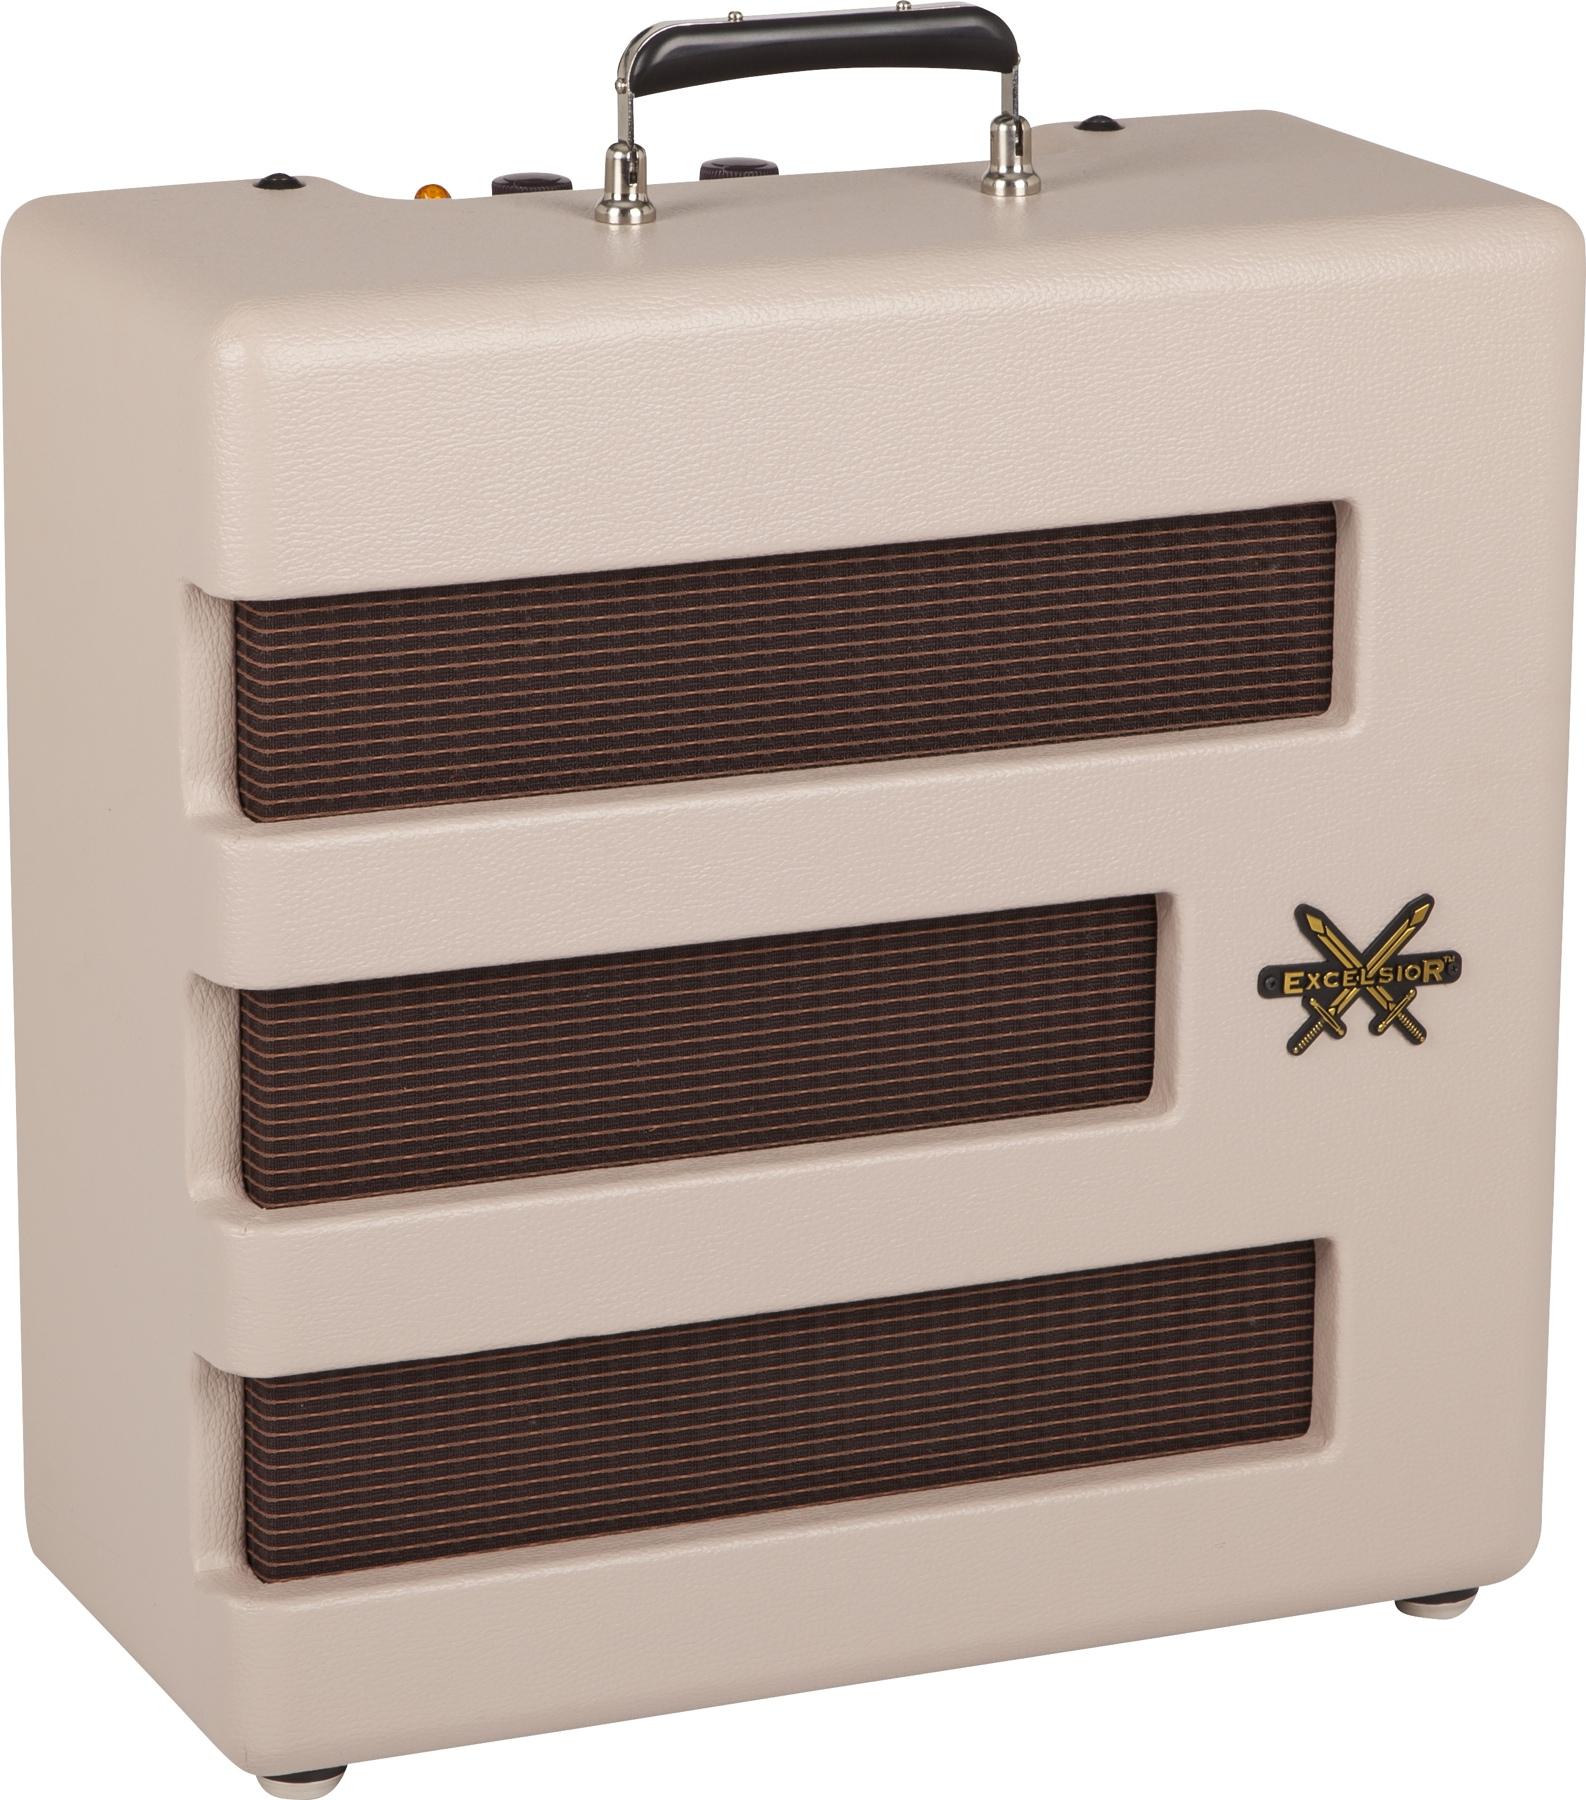 tuki padded amp cover for fender excelsior 1x15 guitar combo amp fend254p ebay. Black Bedroom Furniture Sets. Home Design Ideas